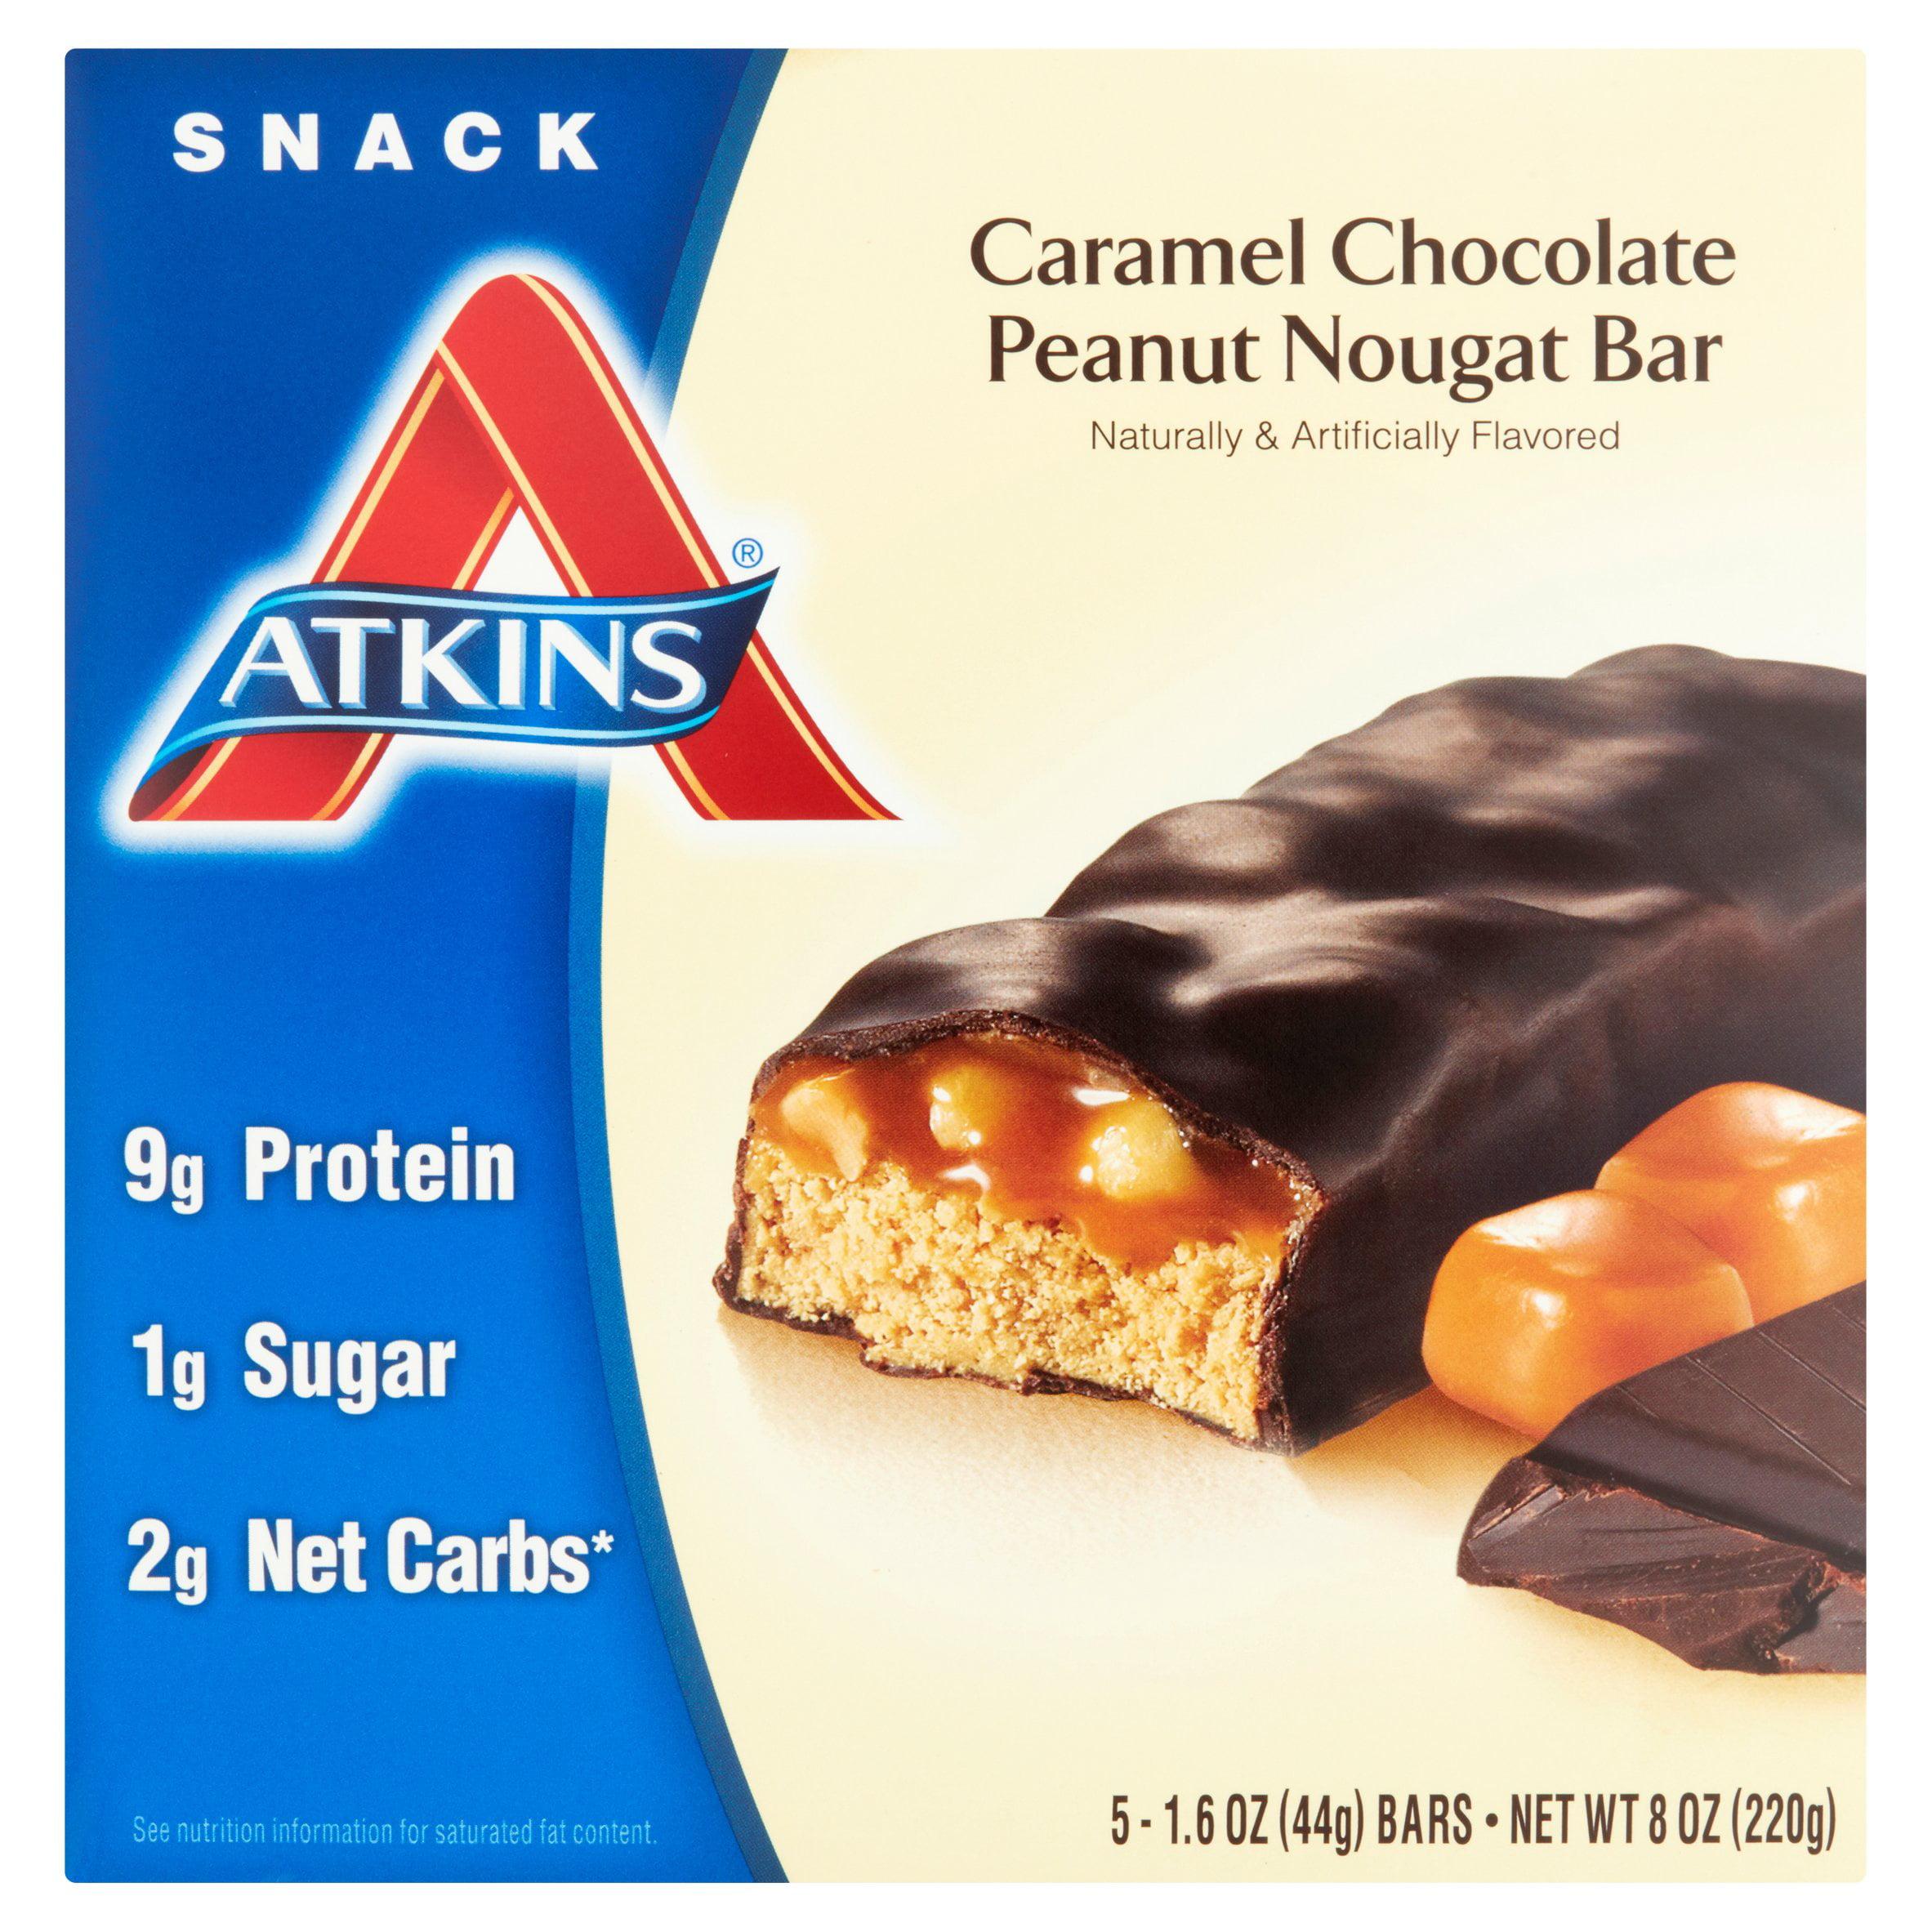 Atkins Snack Caramel Chocolate Peanut Nougat Bars 5-pack